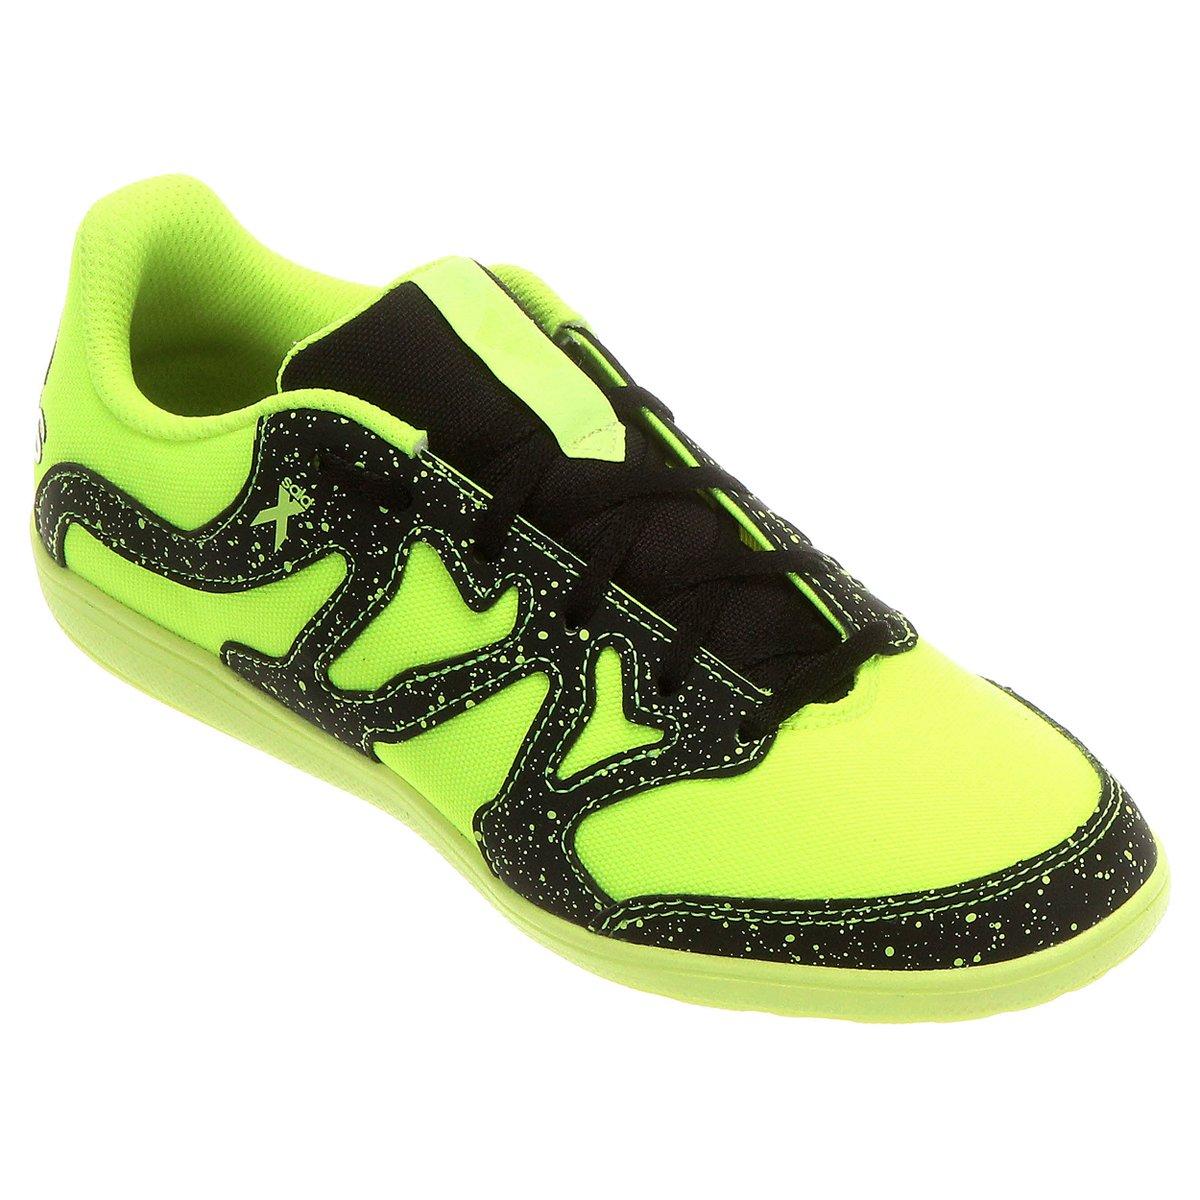 Chuteira Adidas X 15.4 Street Futsal Juvenil - Compre Agora  e0763f35a15d8